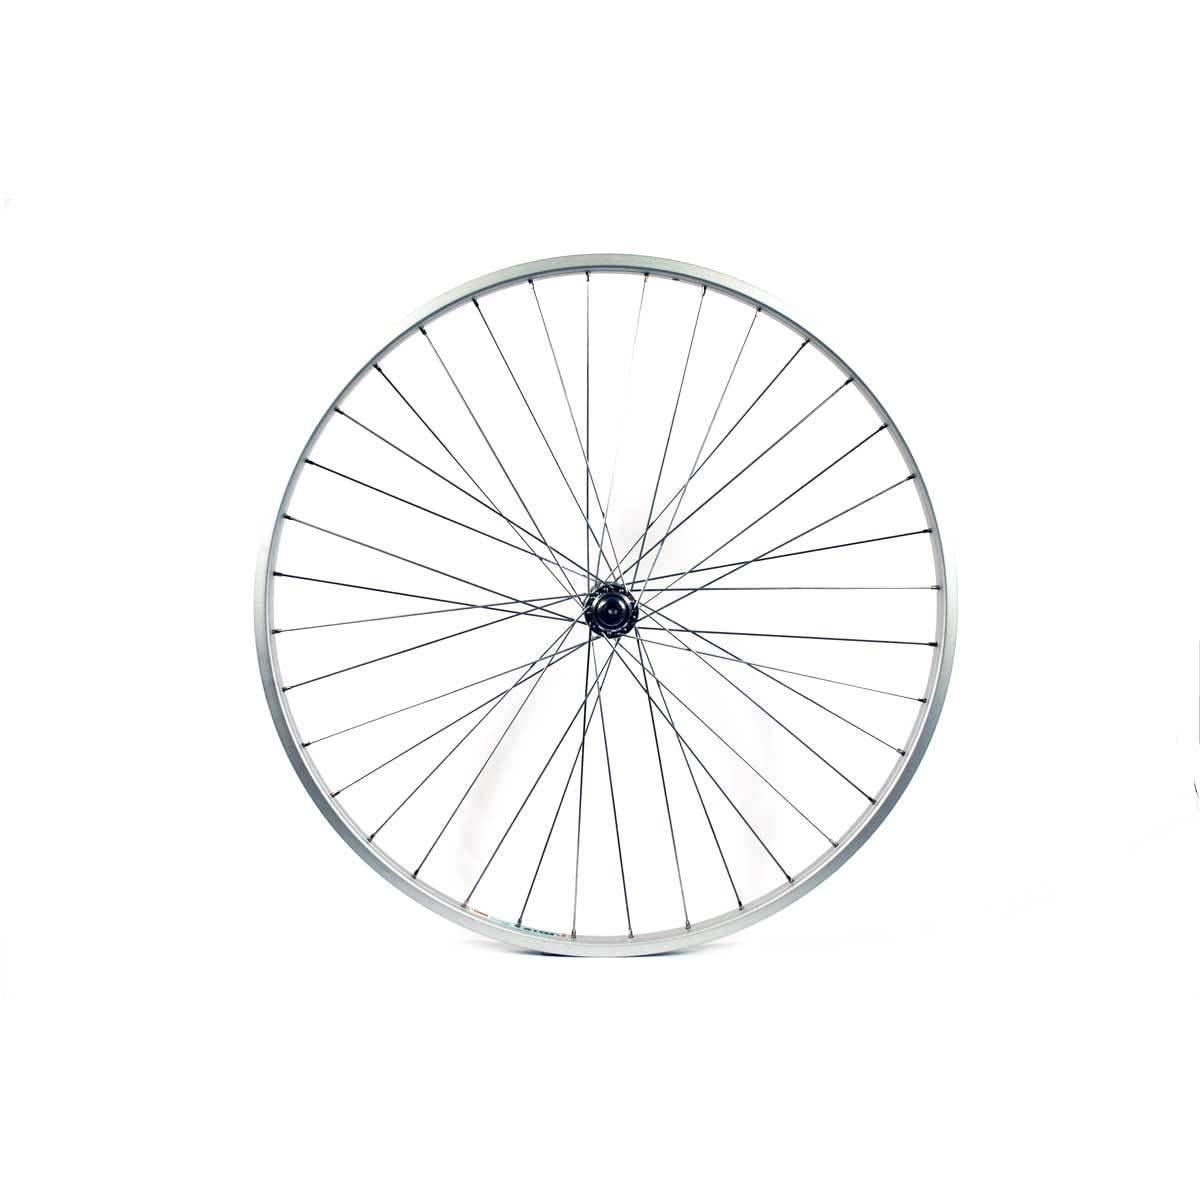 Silver Spokes Silver Solid AX-Largee Hub 27 x 1//1//4 Inches Wilkinson 2714FSW Front Wheel 36 Hole Single Wall Rim